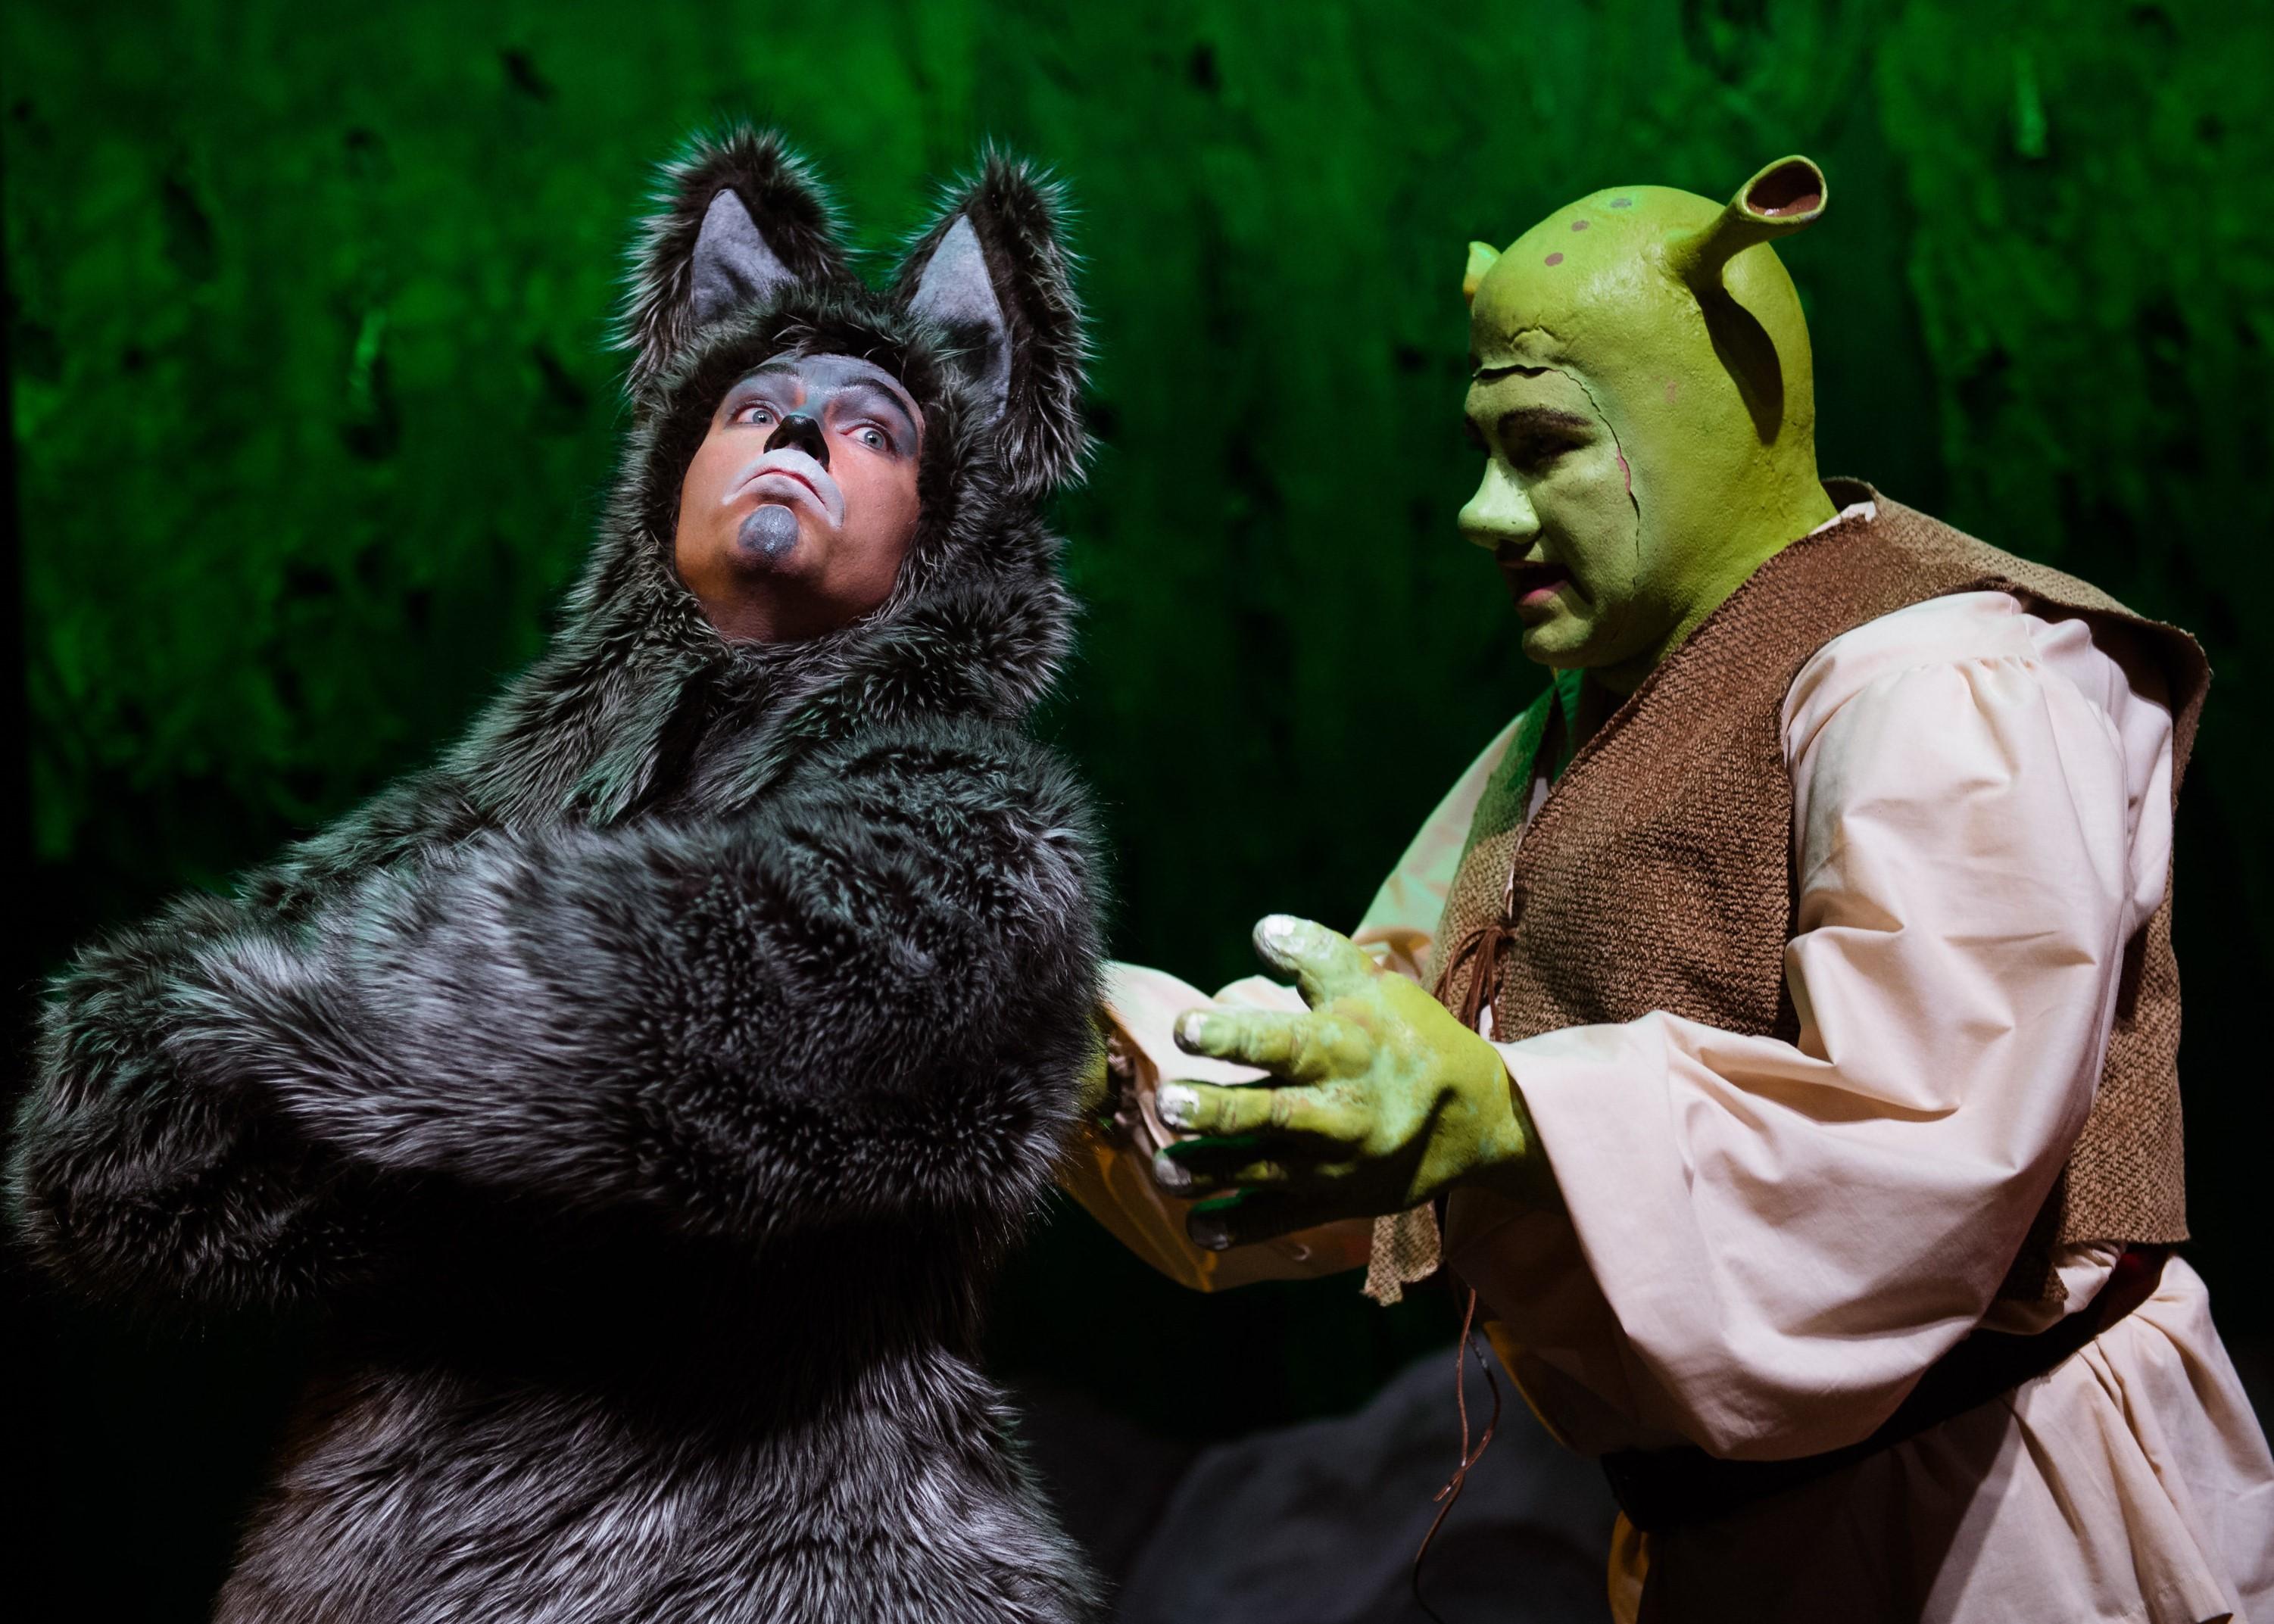 Joshua Redford and Paul Tonden as Donkey and Shrek. Photo by Traci J. Brooks Studios.